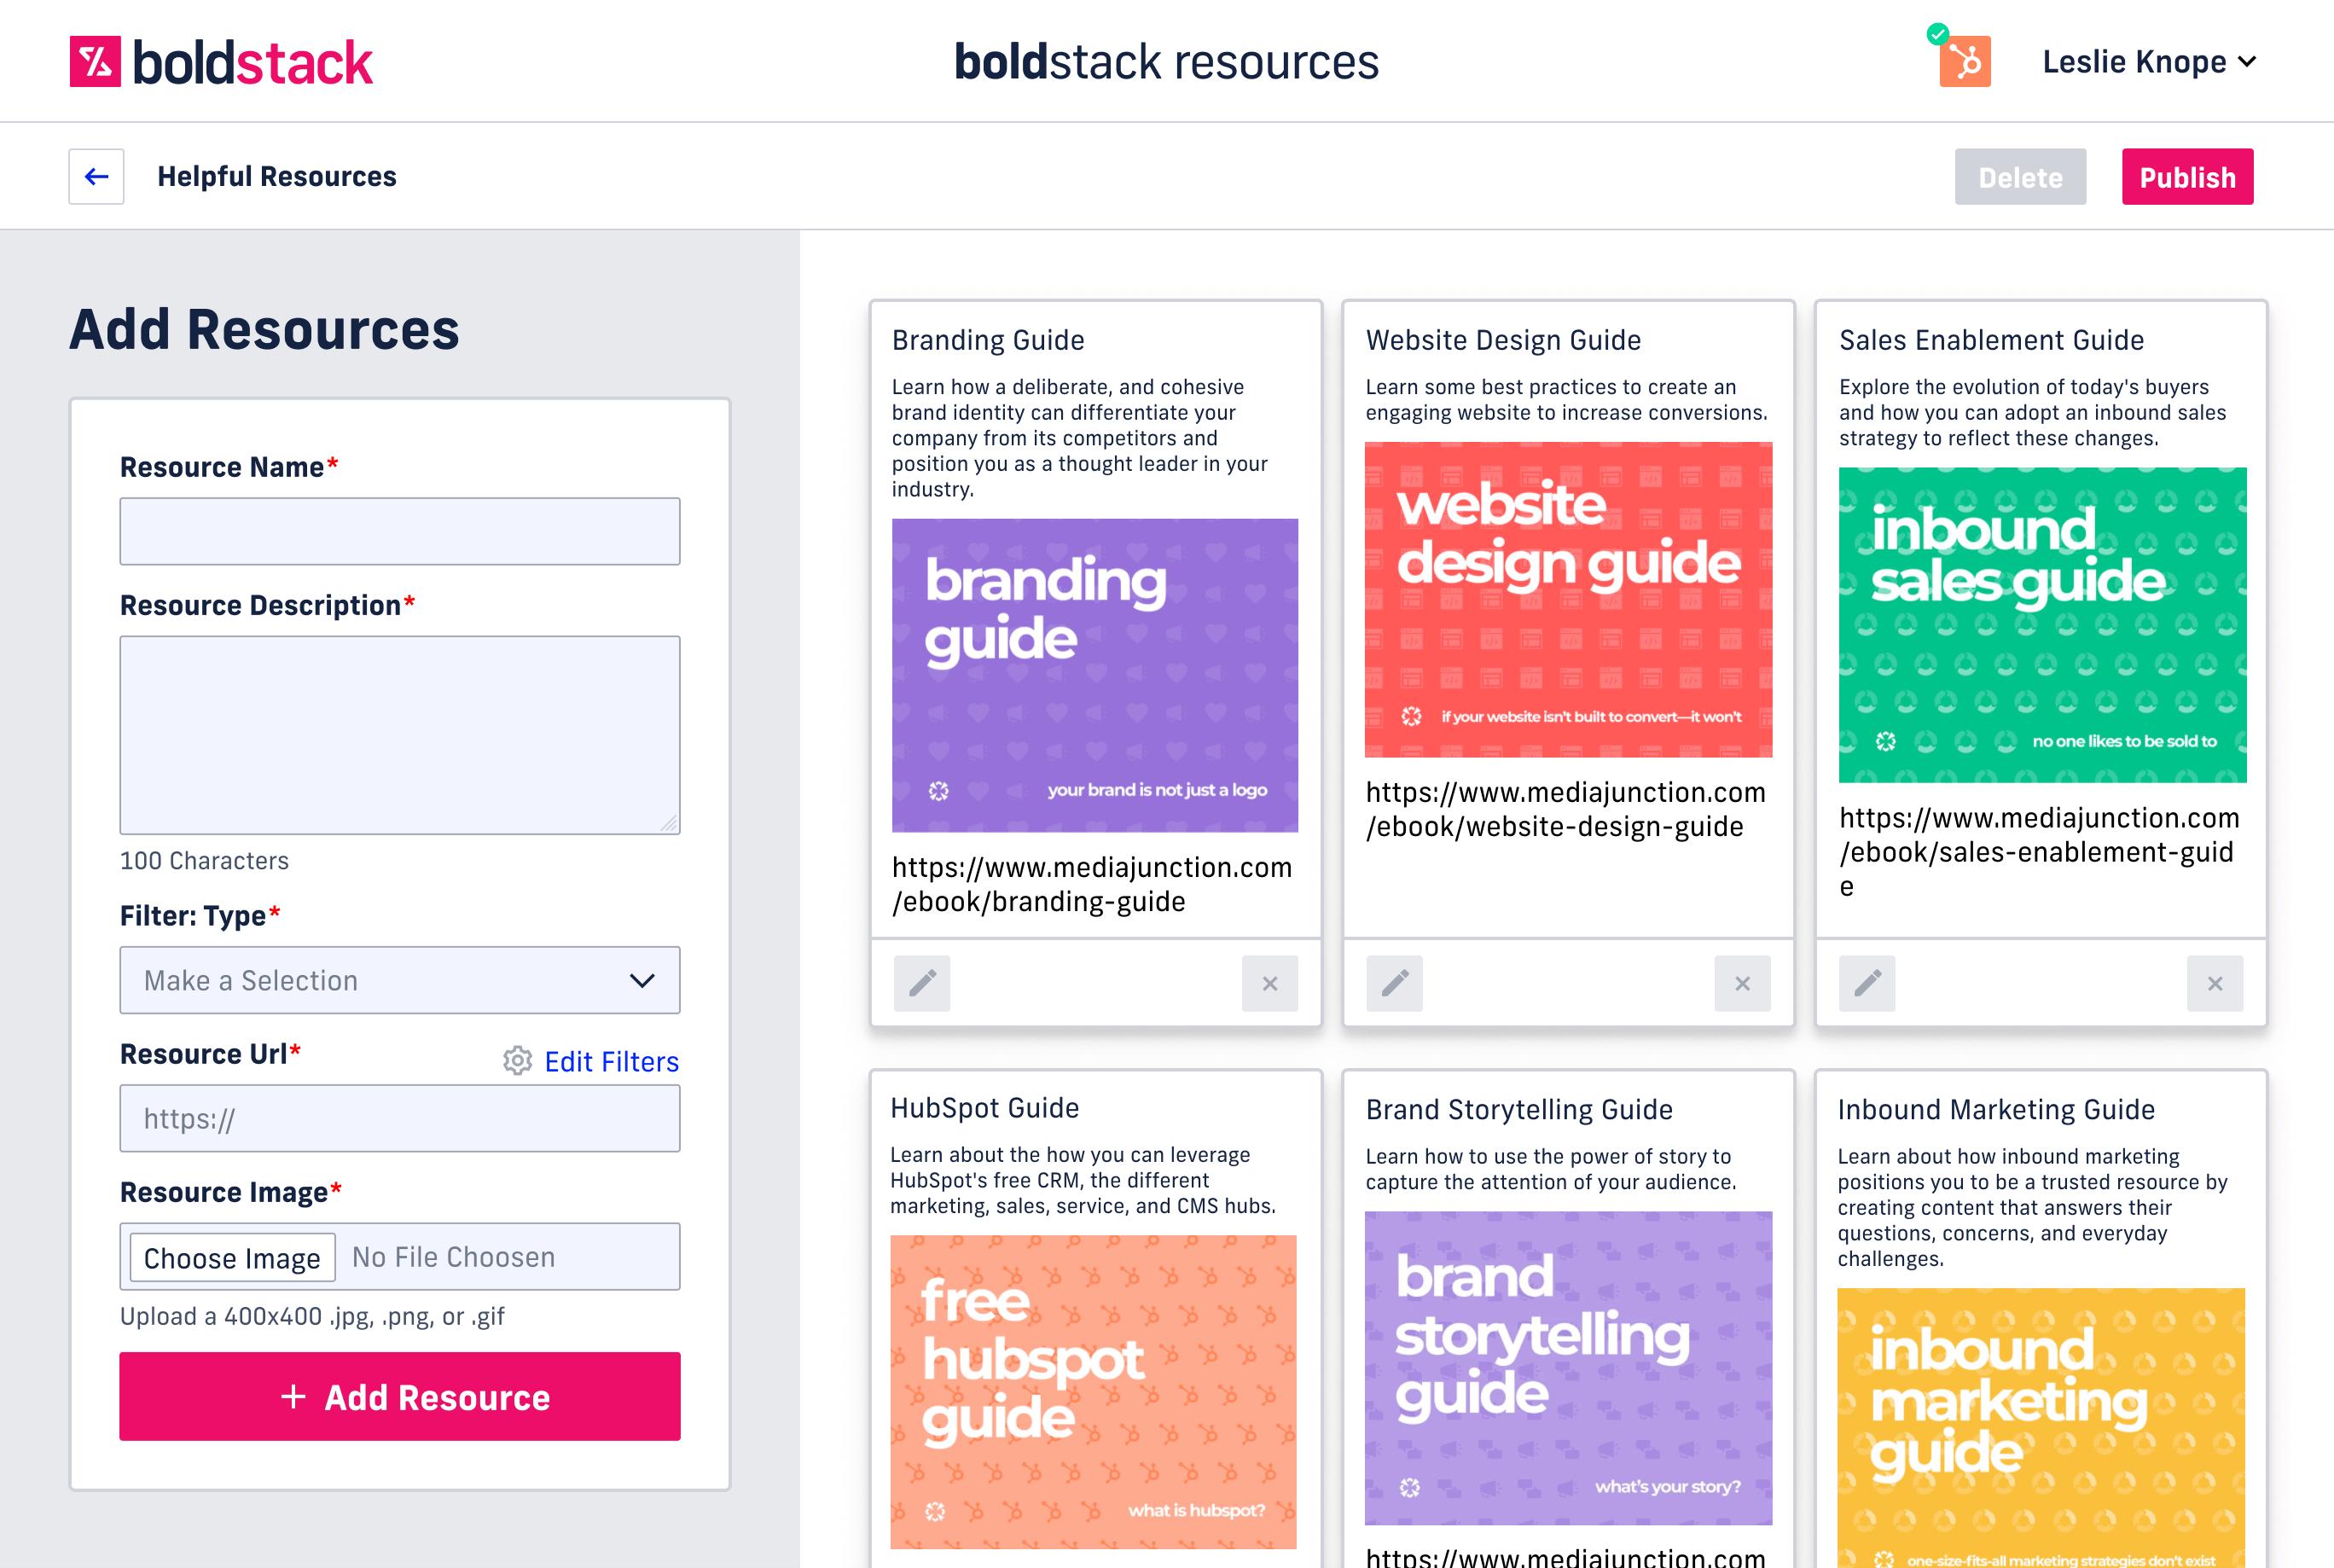 app-screen-db-edit